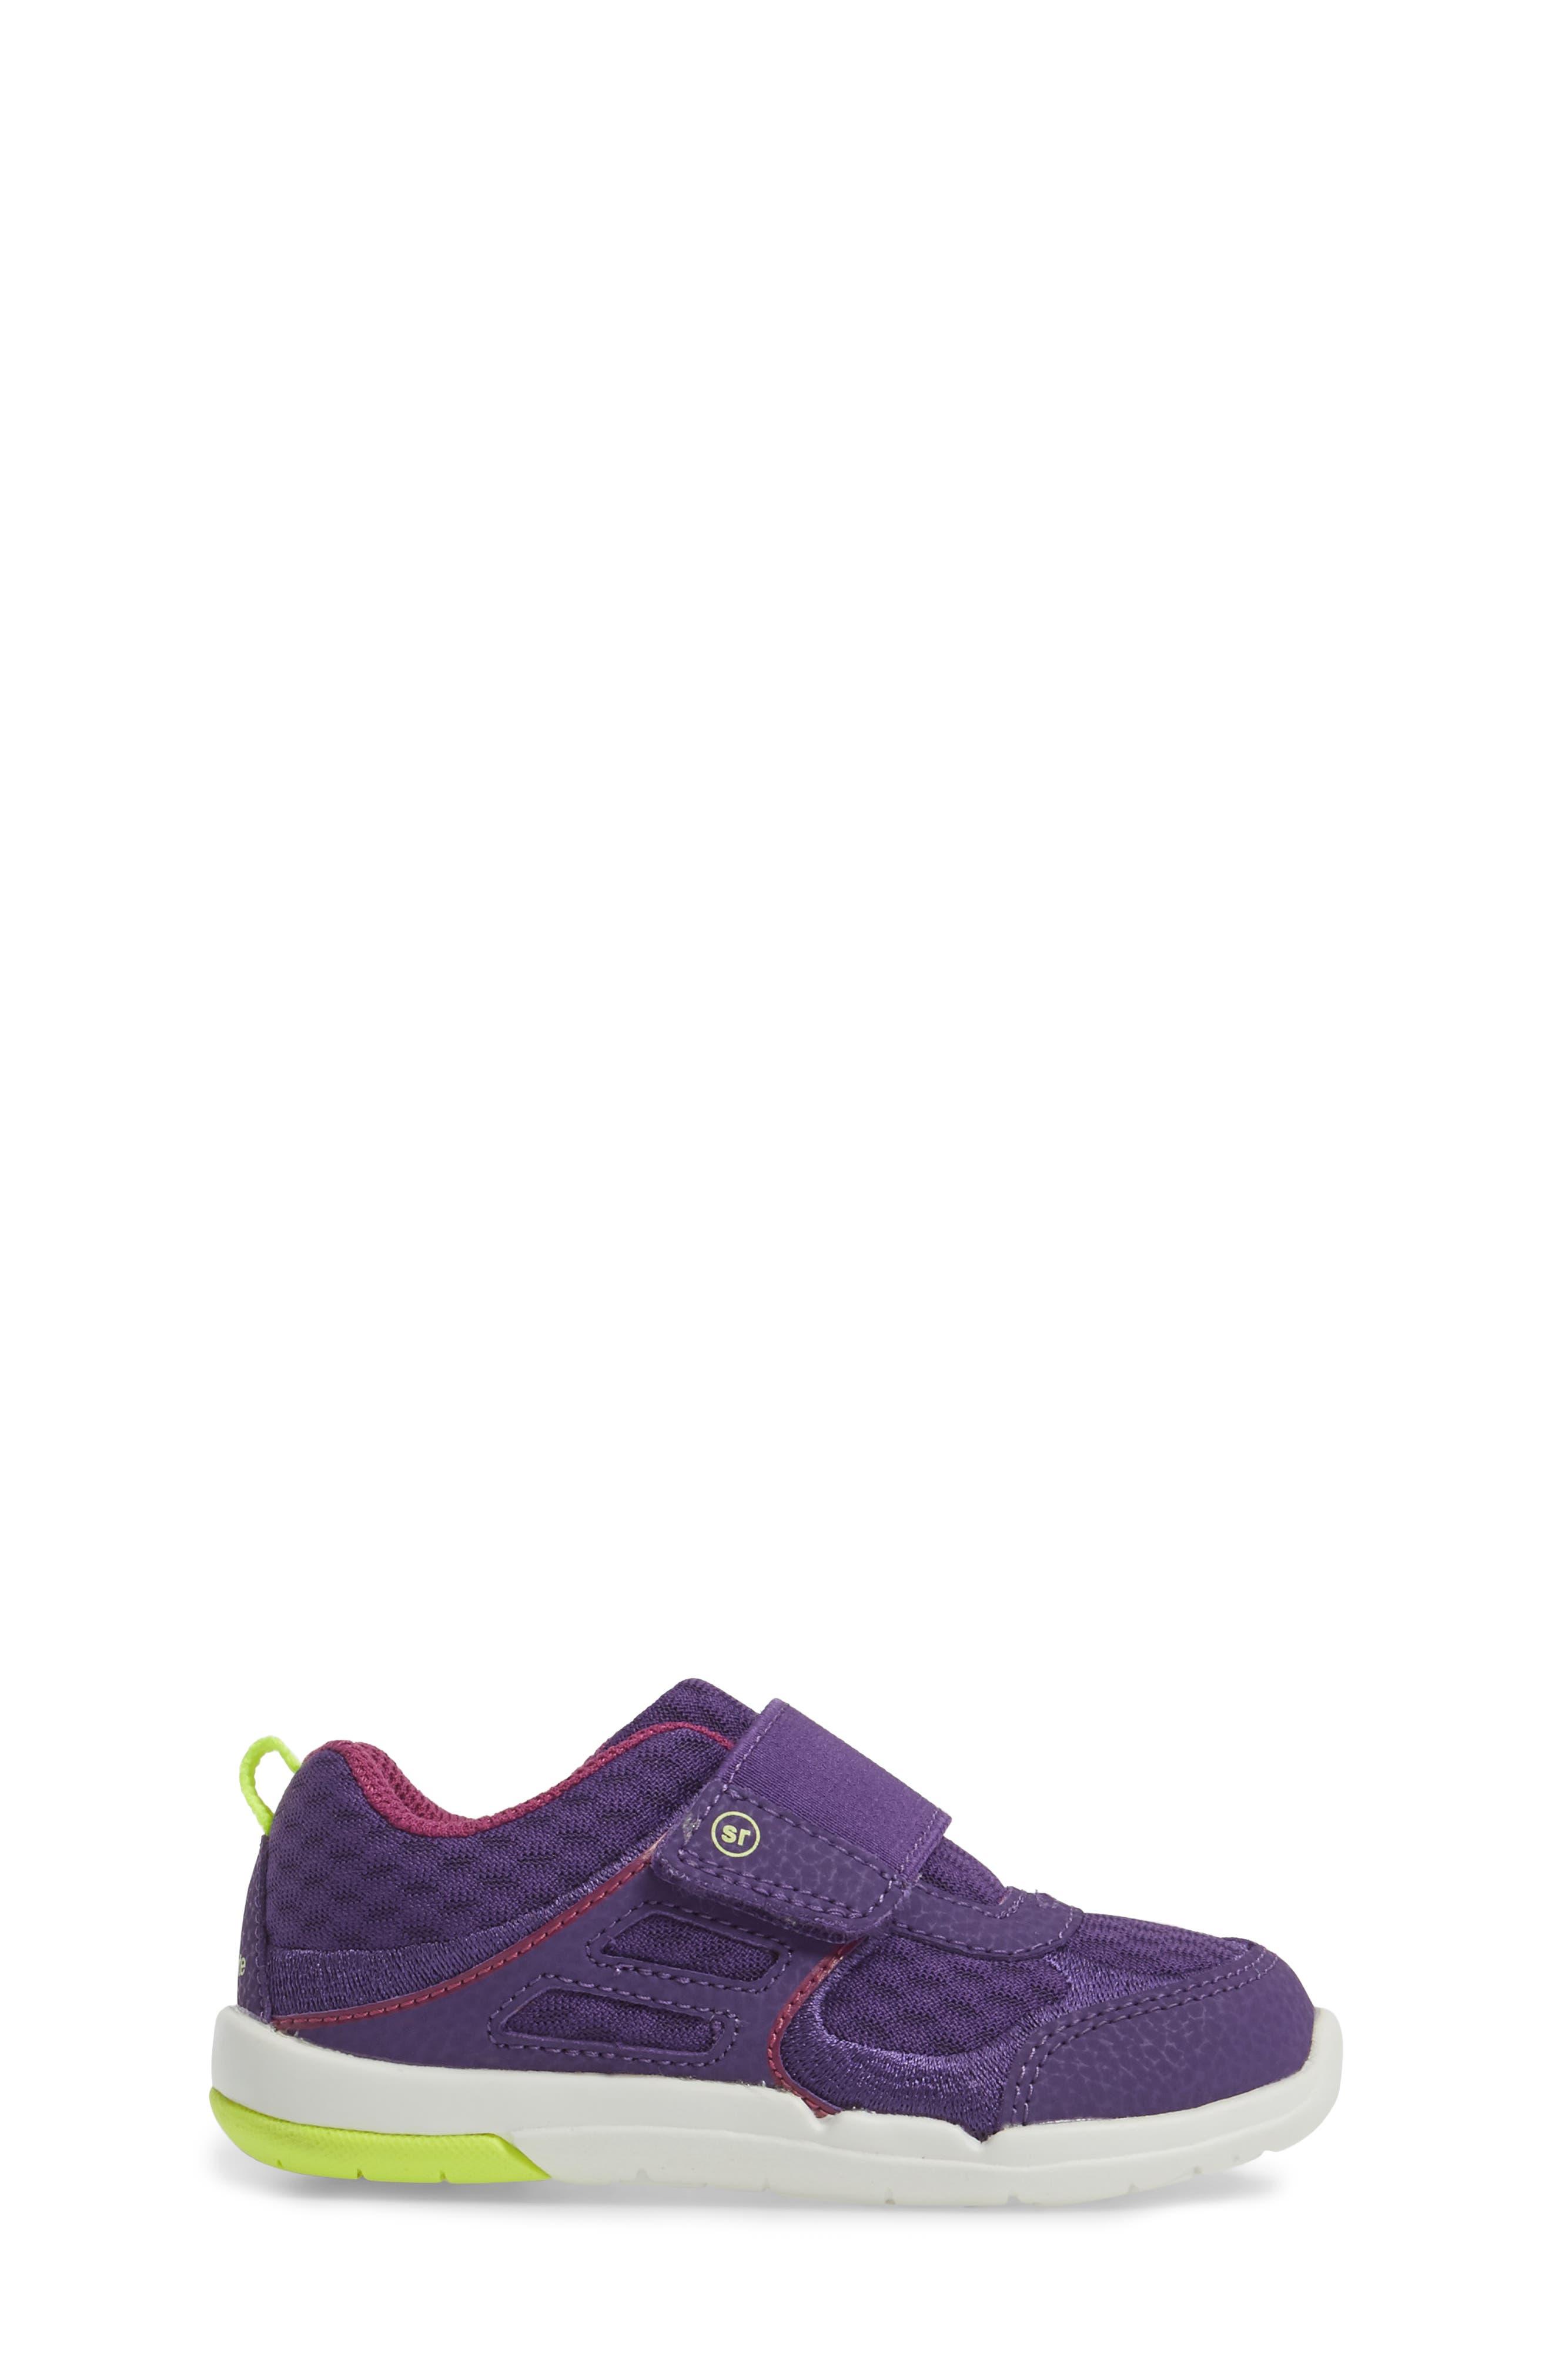 Casey Sneaker,                             Alternate thumbnail 3, color,                             Purple